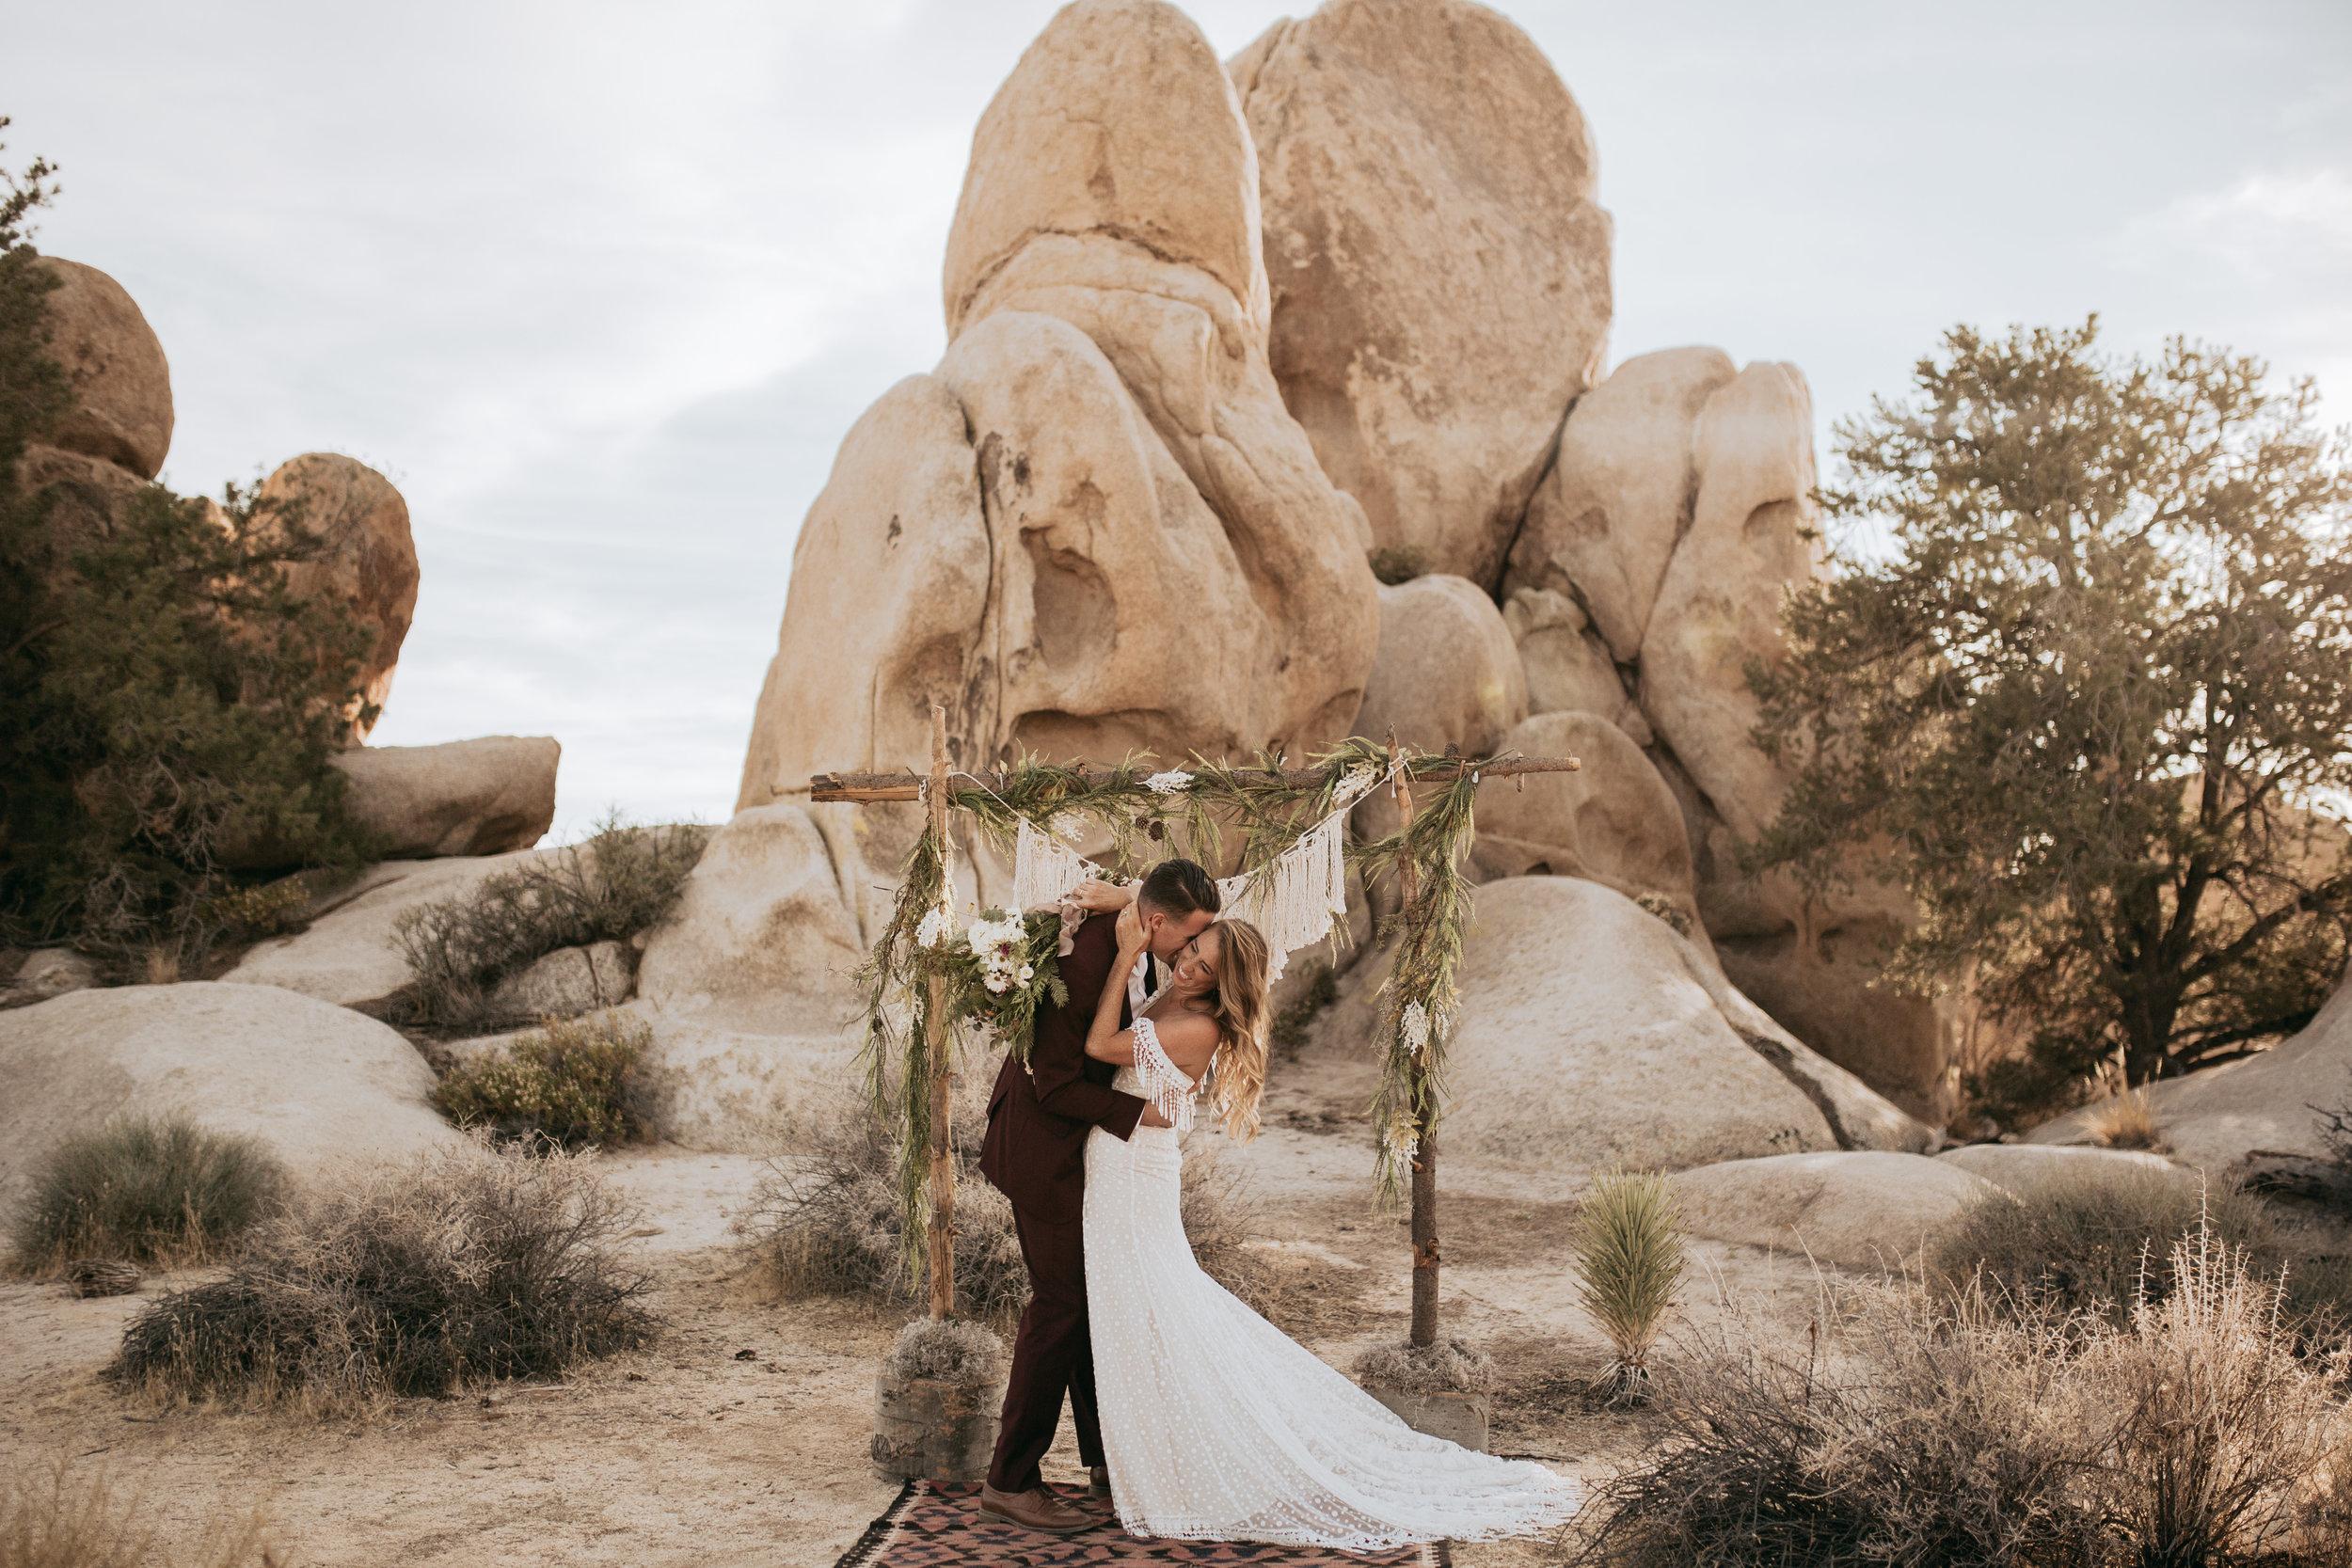 palmsprings_joshuatree_california_wedding_photographer-16.jpg